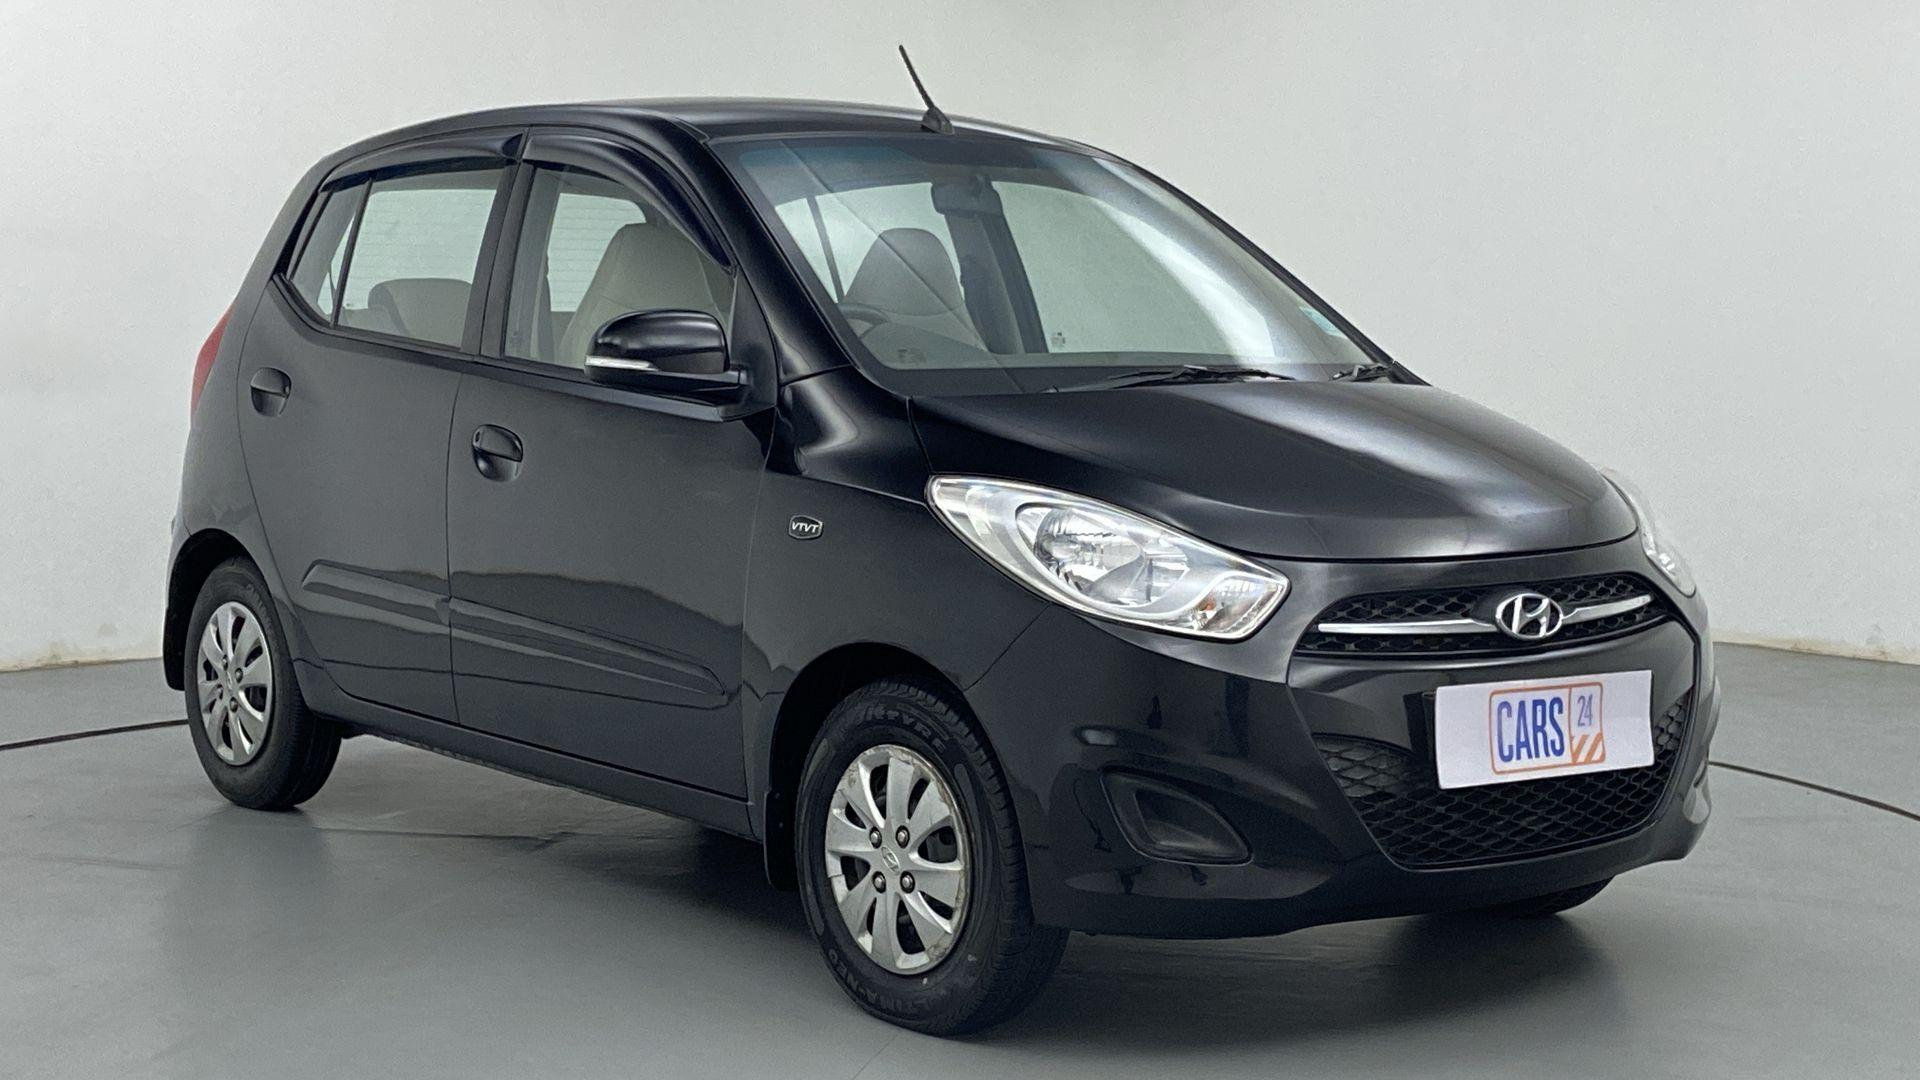 2011 Hyundai i10 SPORTZ 1.2 AT KAPPA2